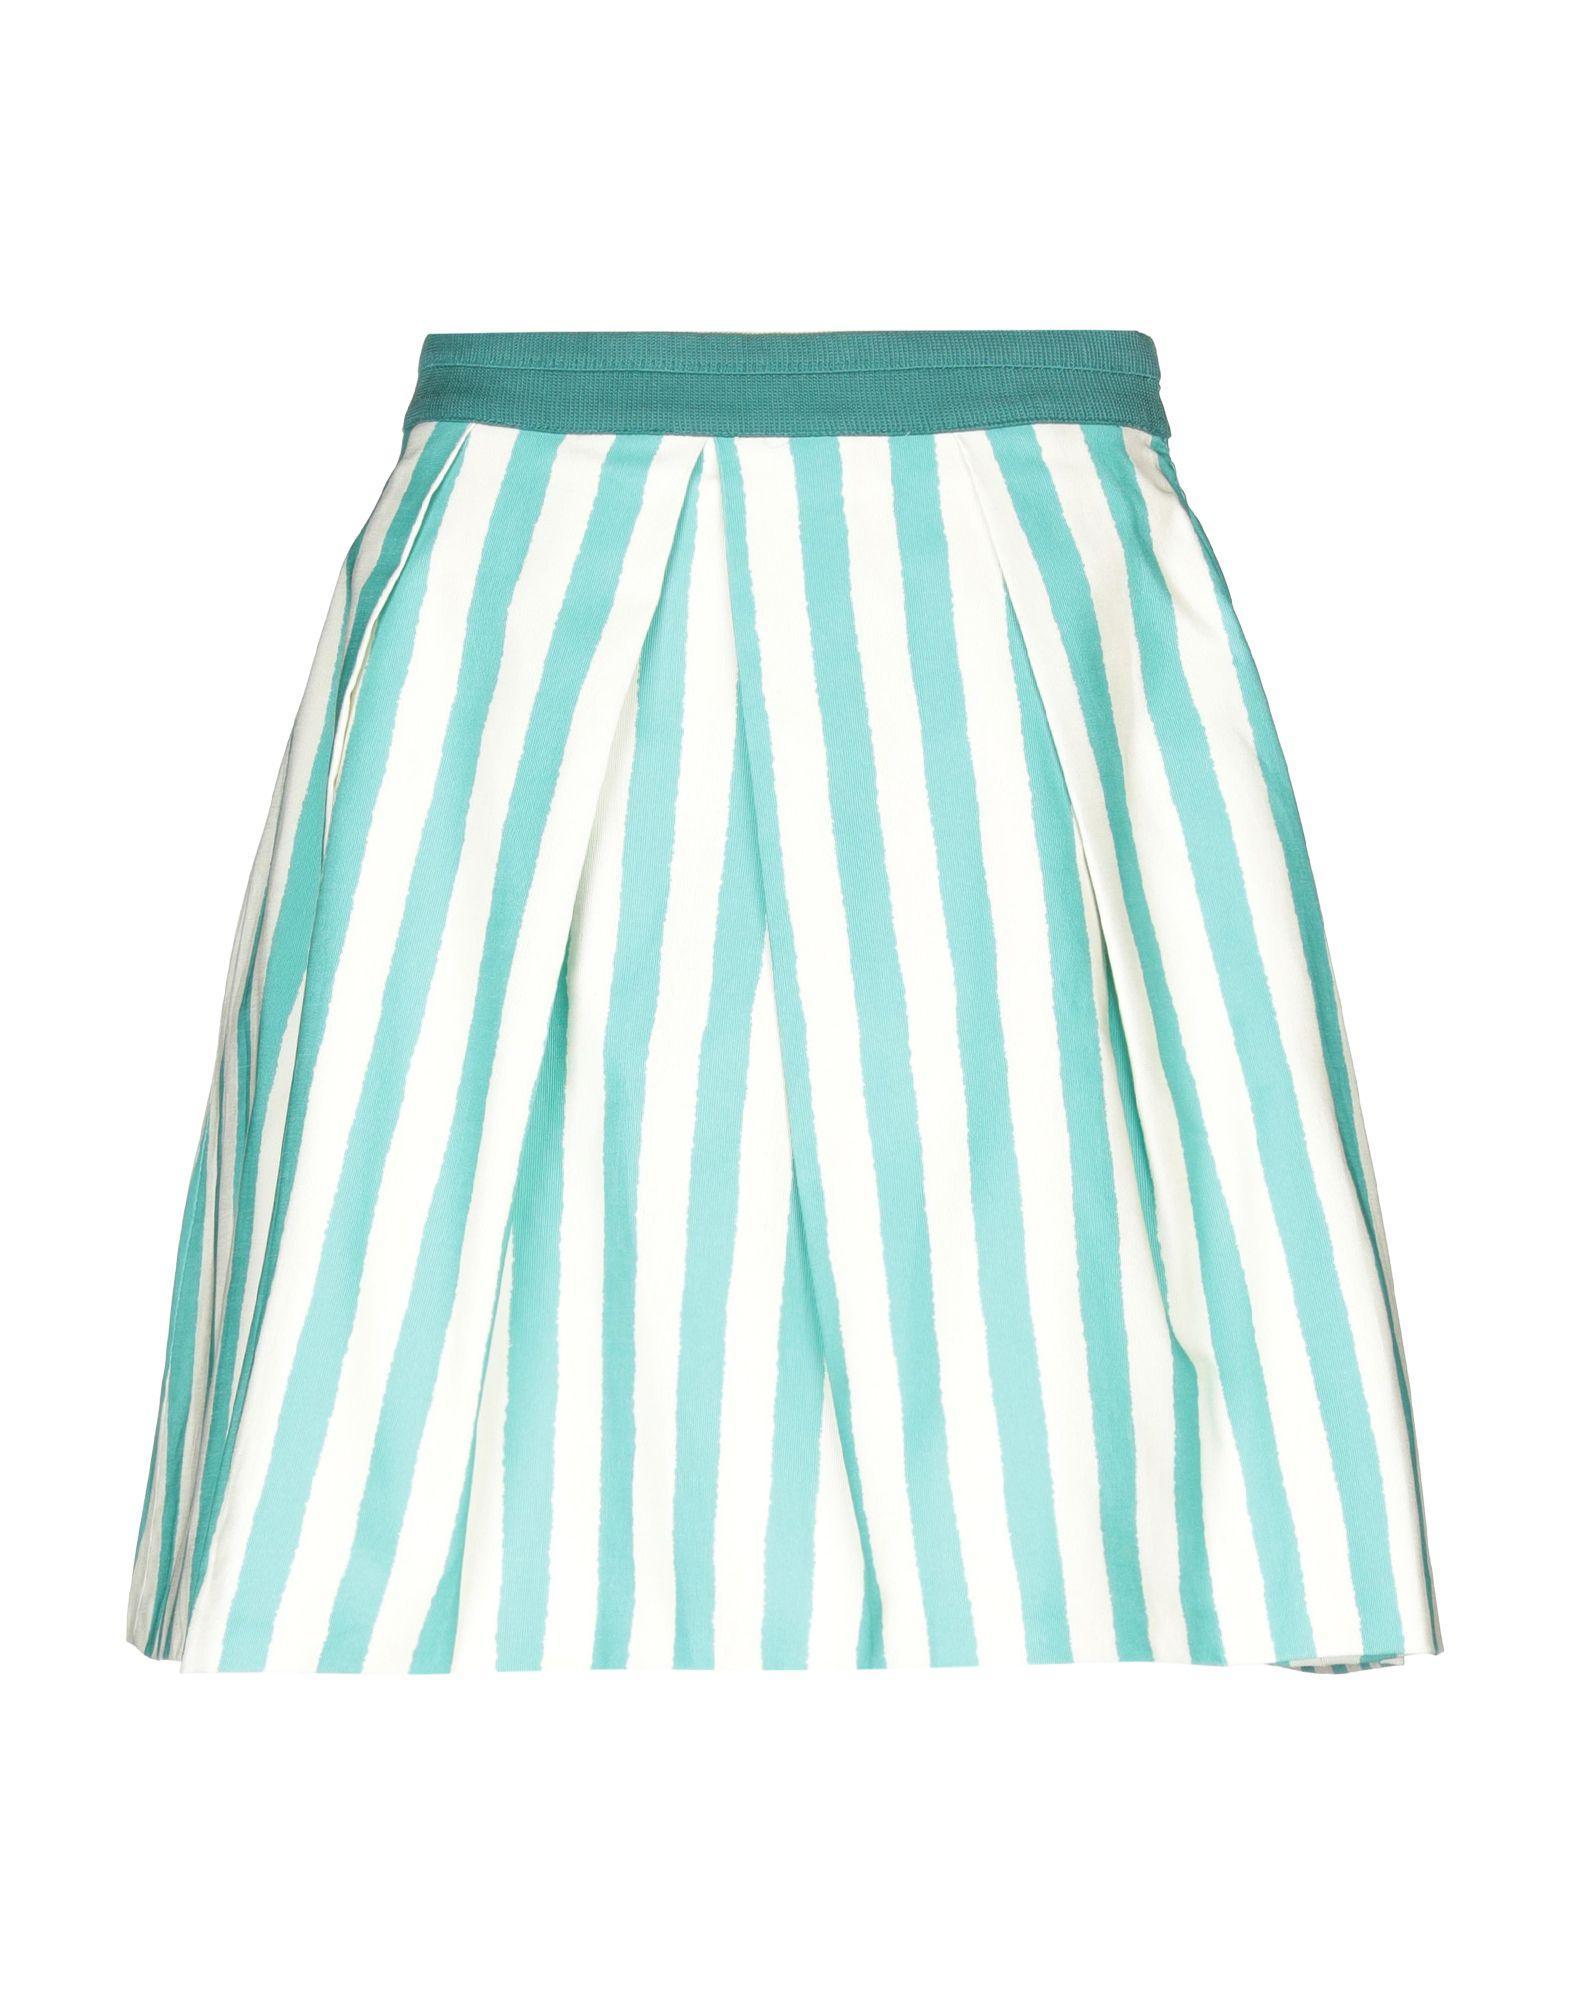 Юбка до колена  - Голубой цвет